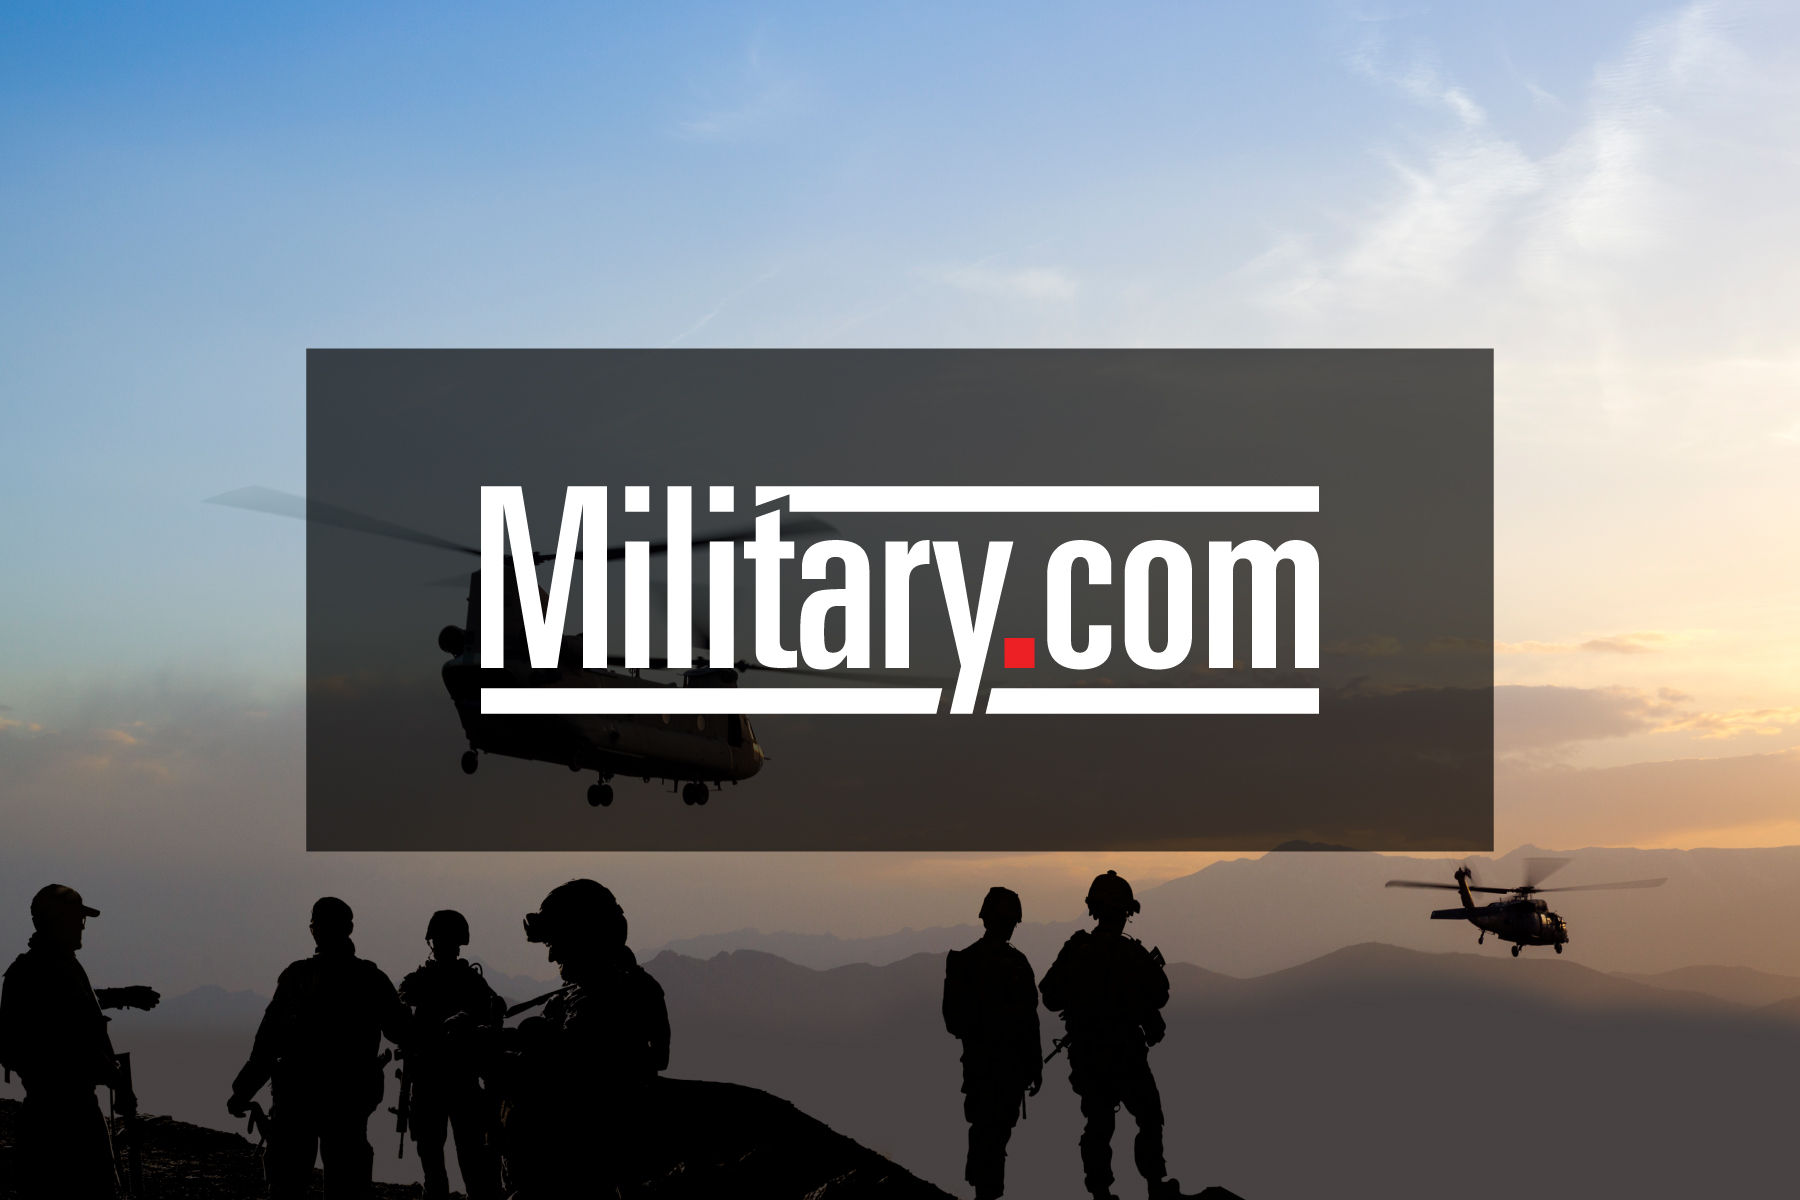 Senate Votes To Confirm Trump S Pick For Army Secretary